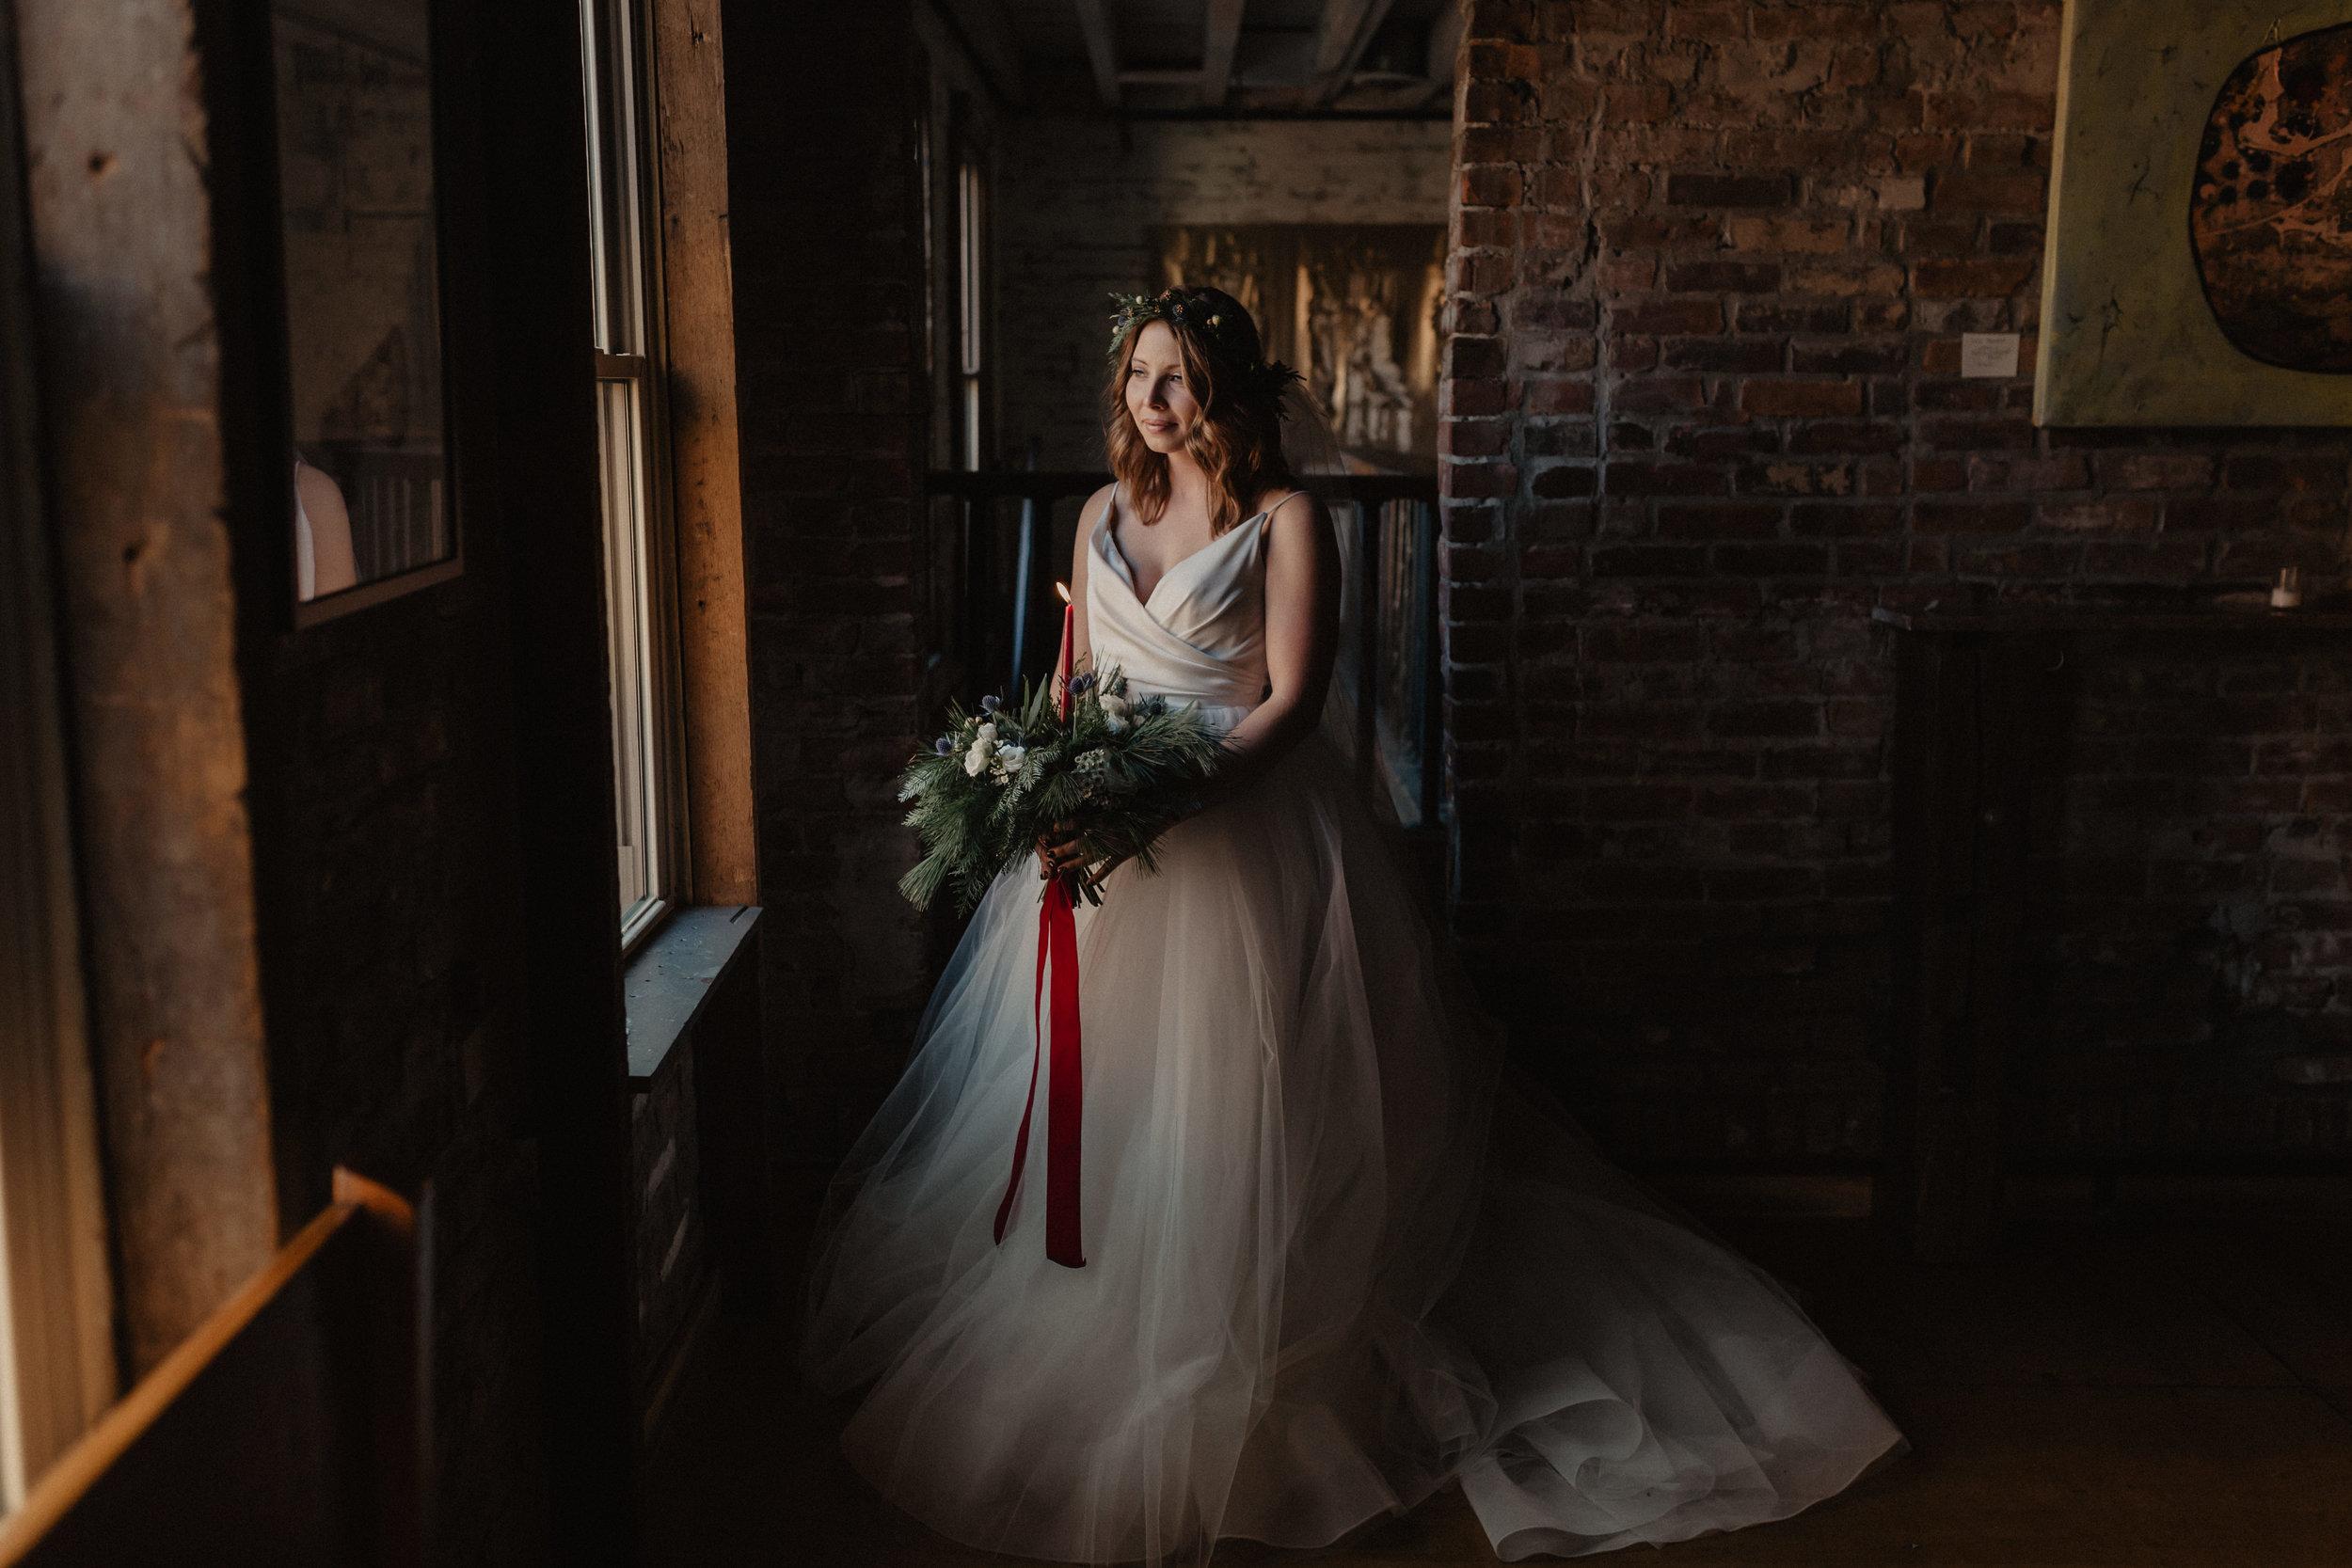 lucas_confectionery_wedding-59.jpg